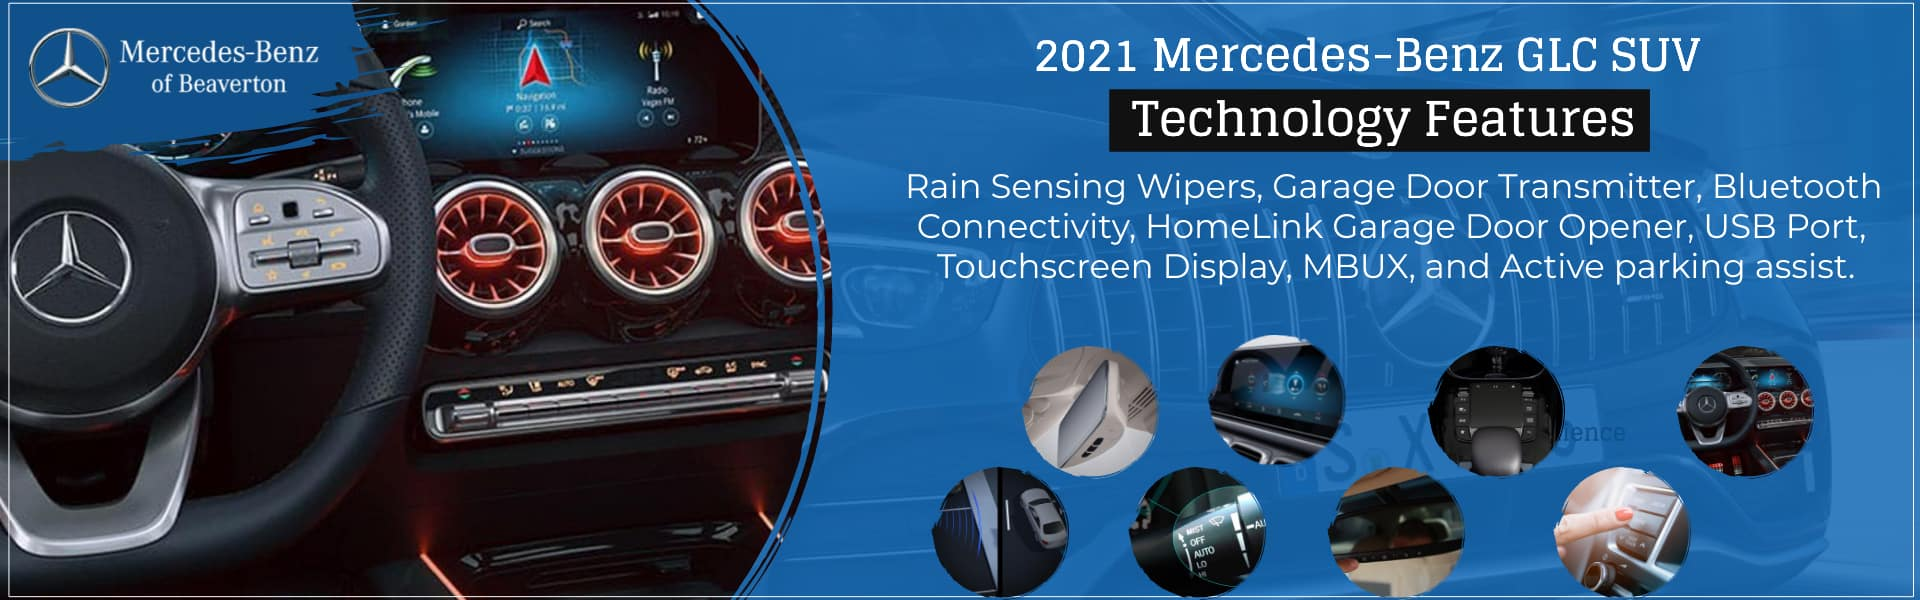 2021 Mercedes-Benz GLC SUV of Beaverton Technology